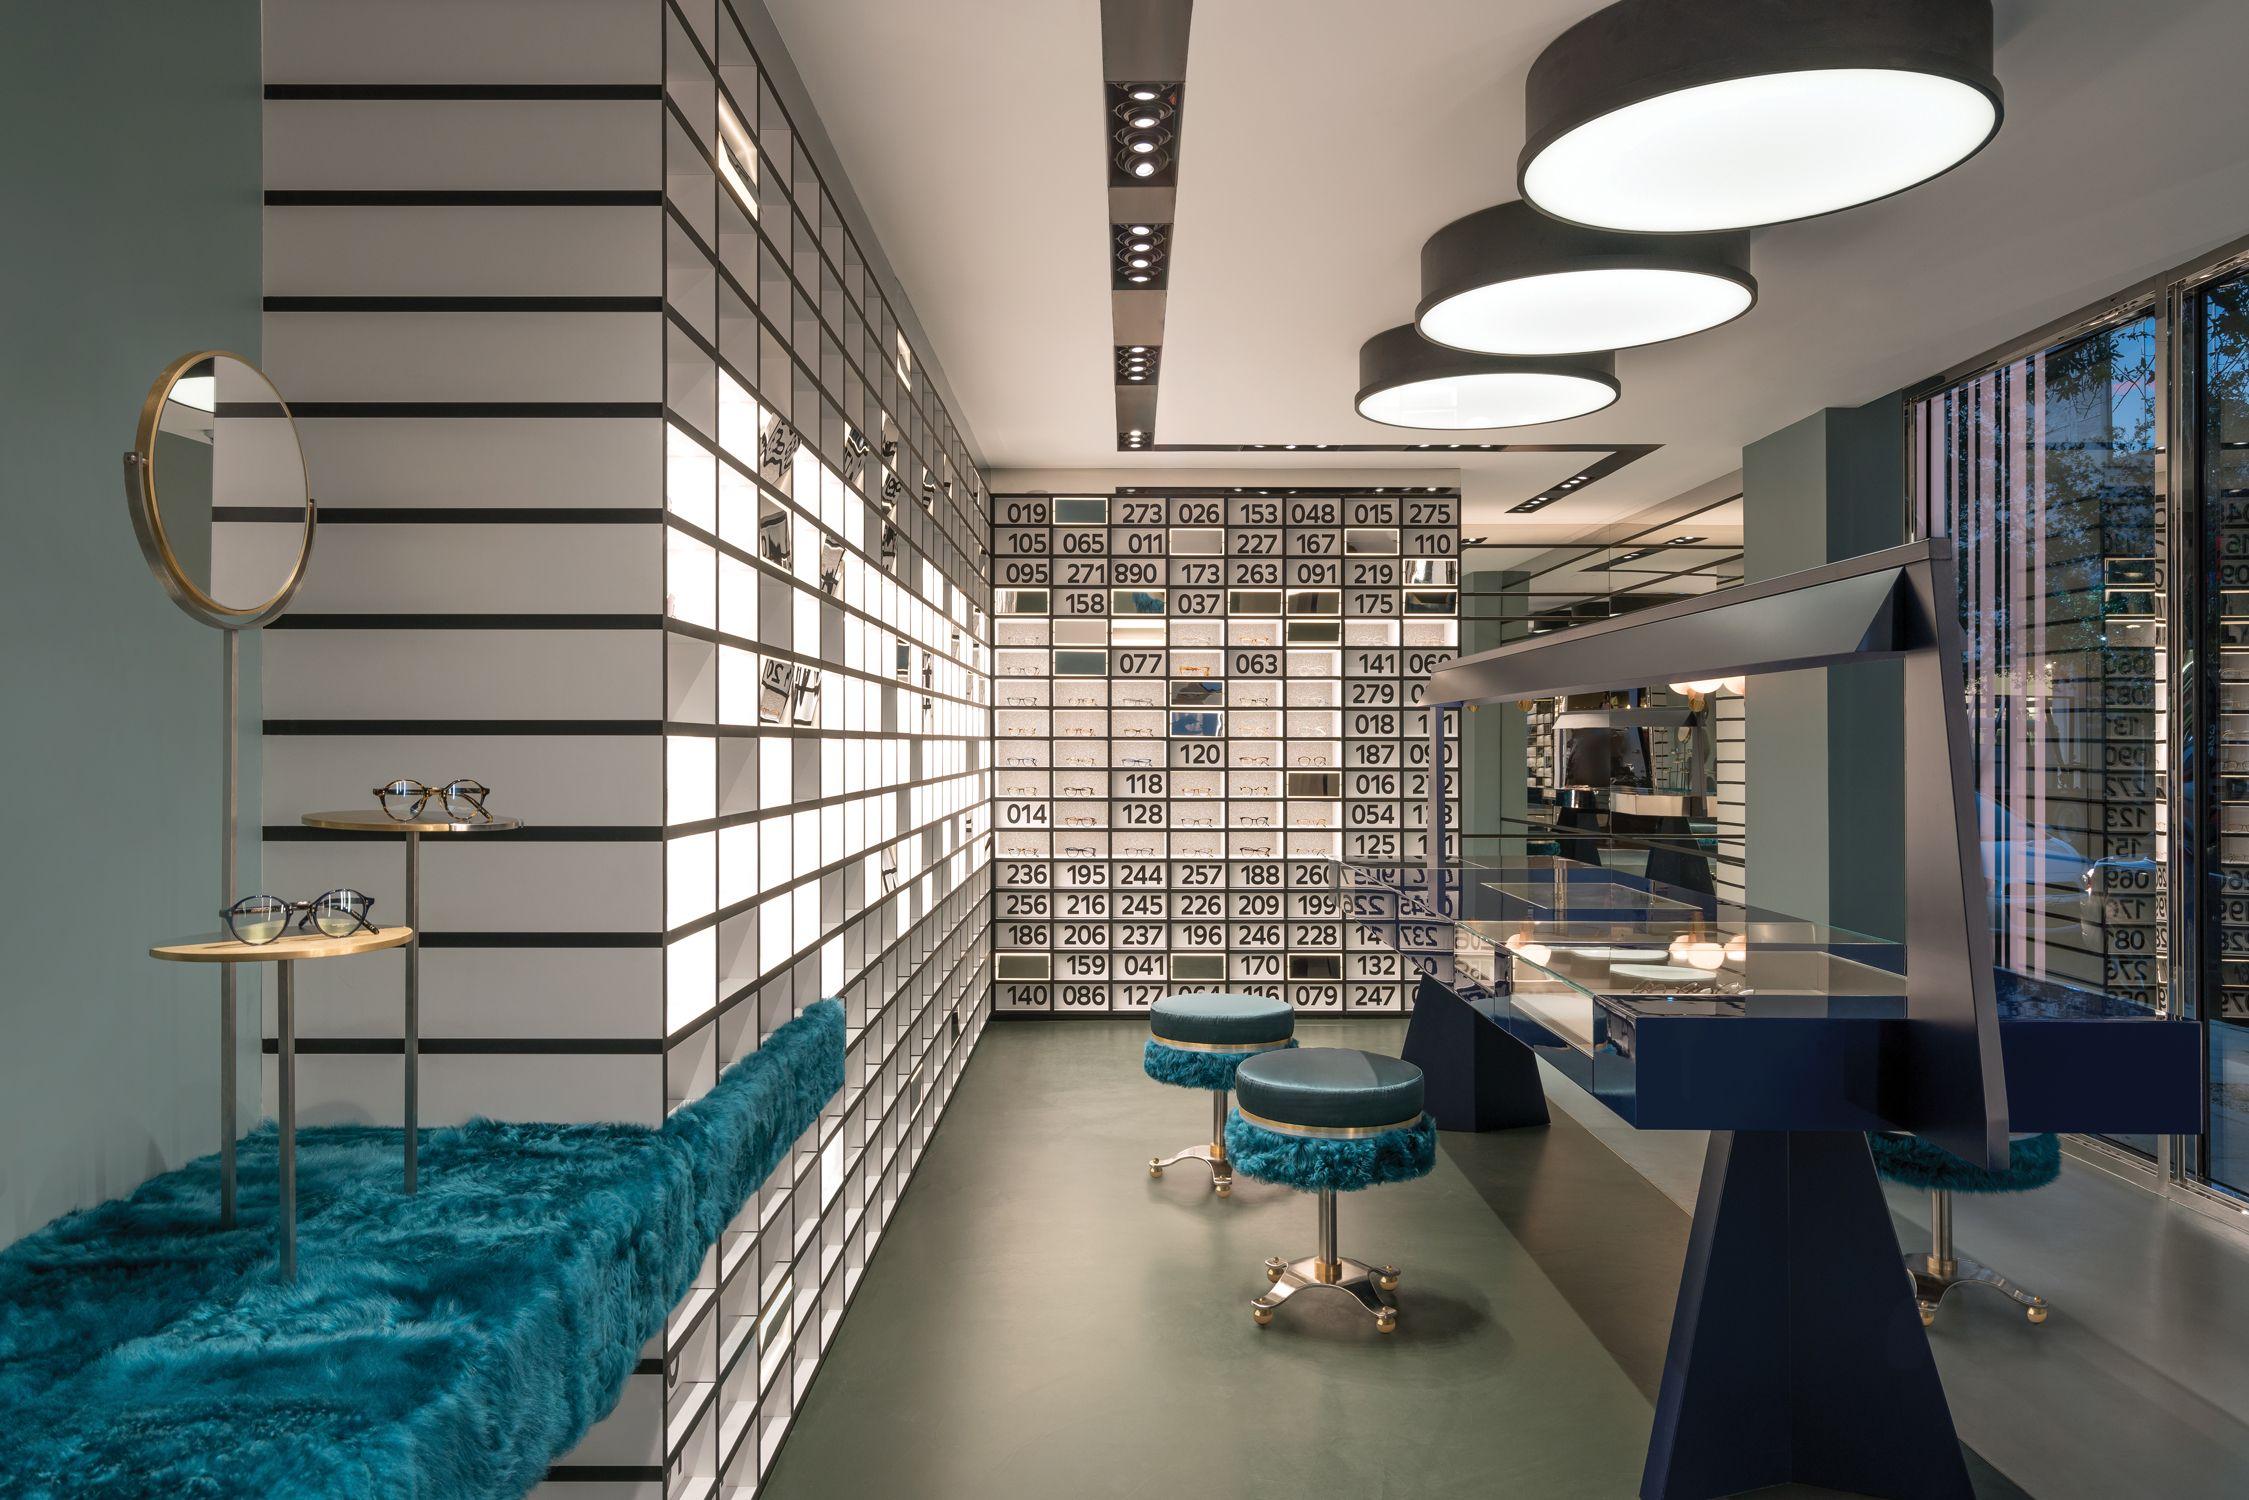 Oliver peoples miami interiordesign retail store eyewear interior decorating interior